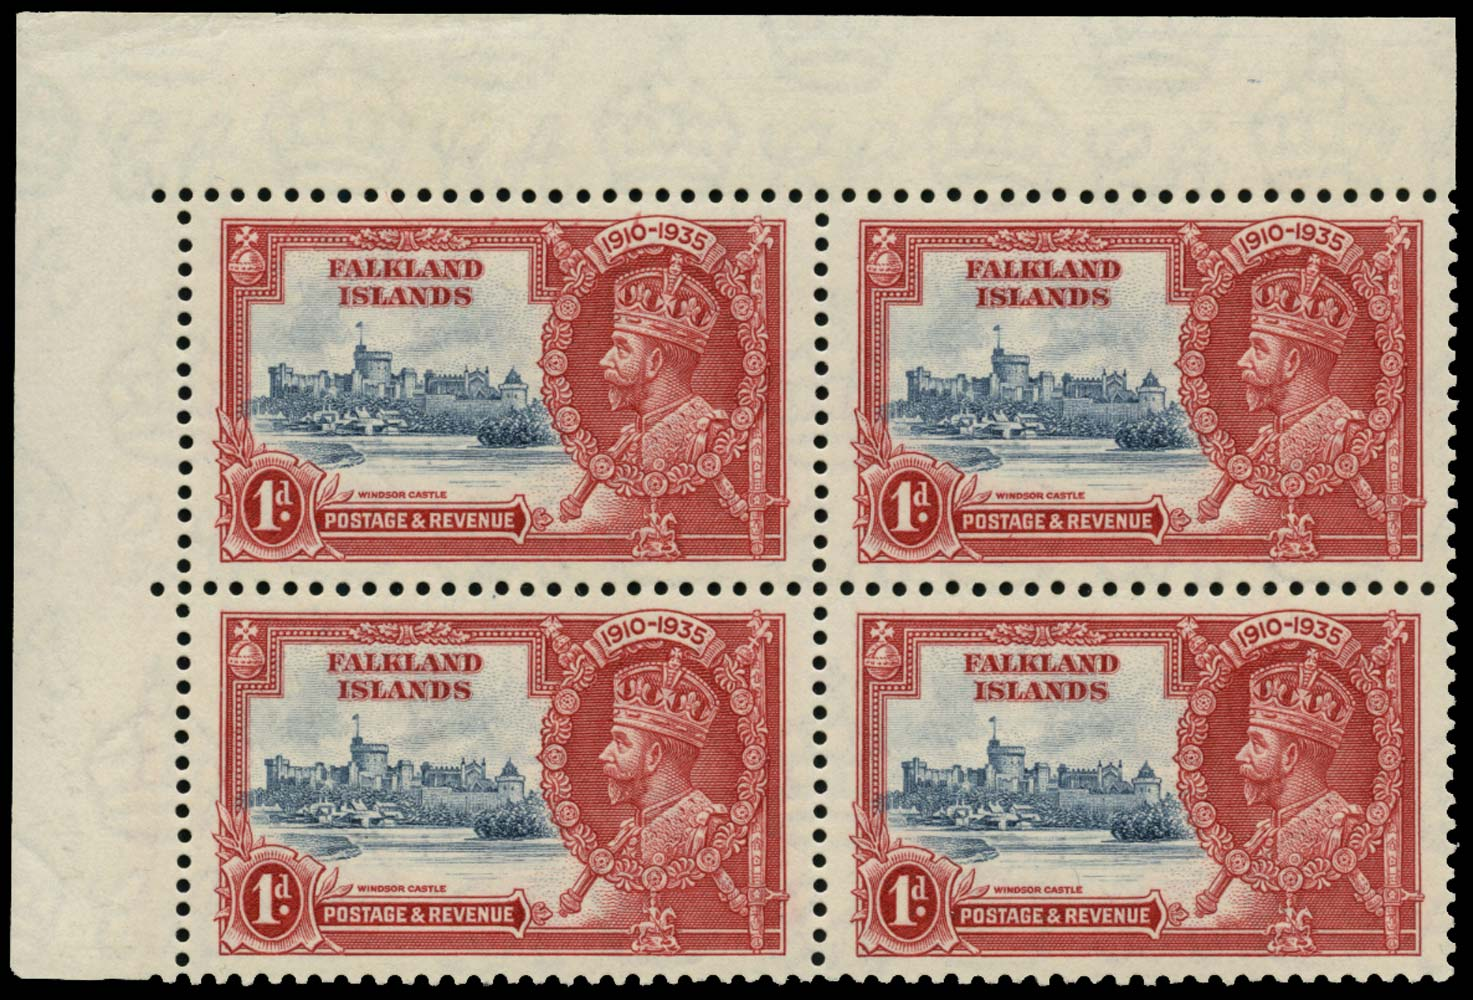 FALKLAND ISLANDS 1935  SG139/b Mint 1d Short Extra Flagstaff